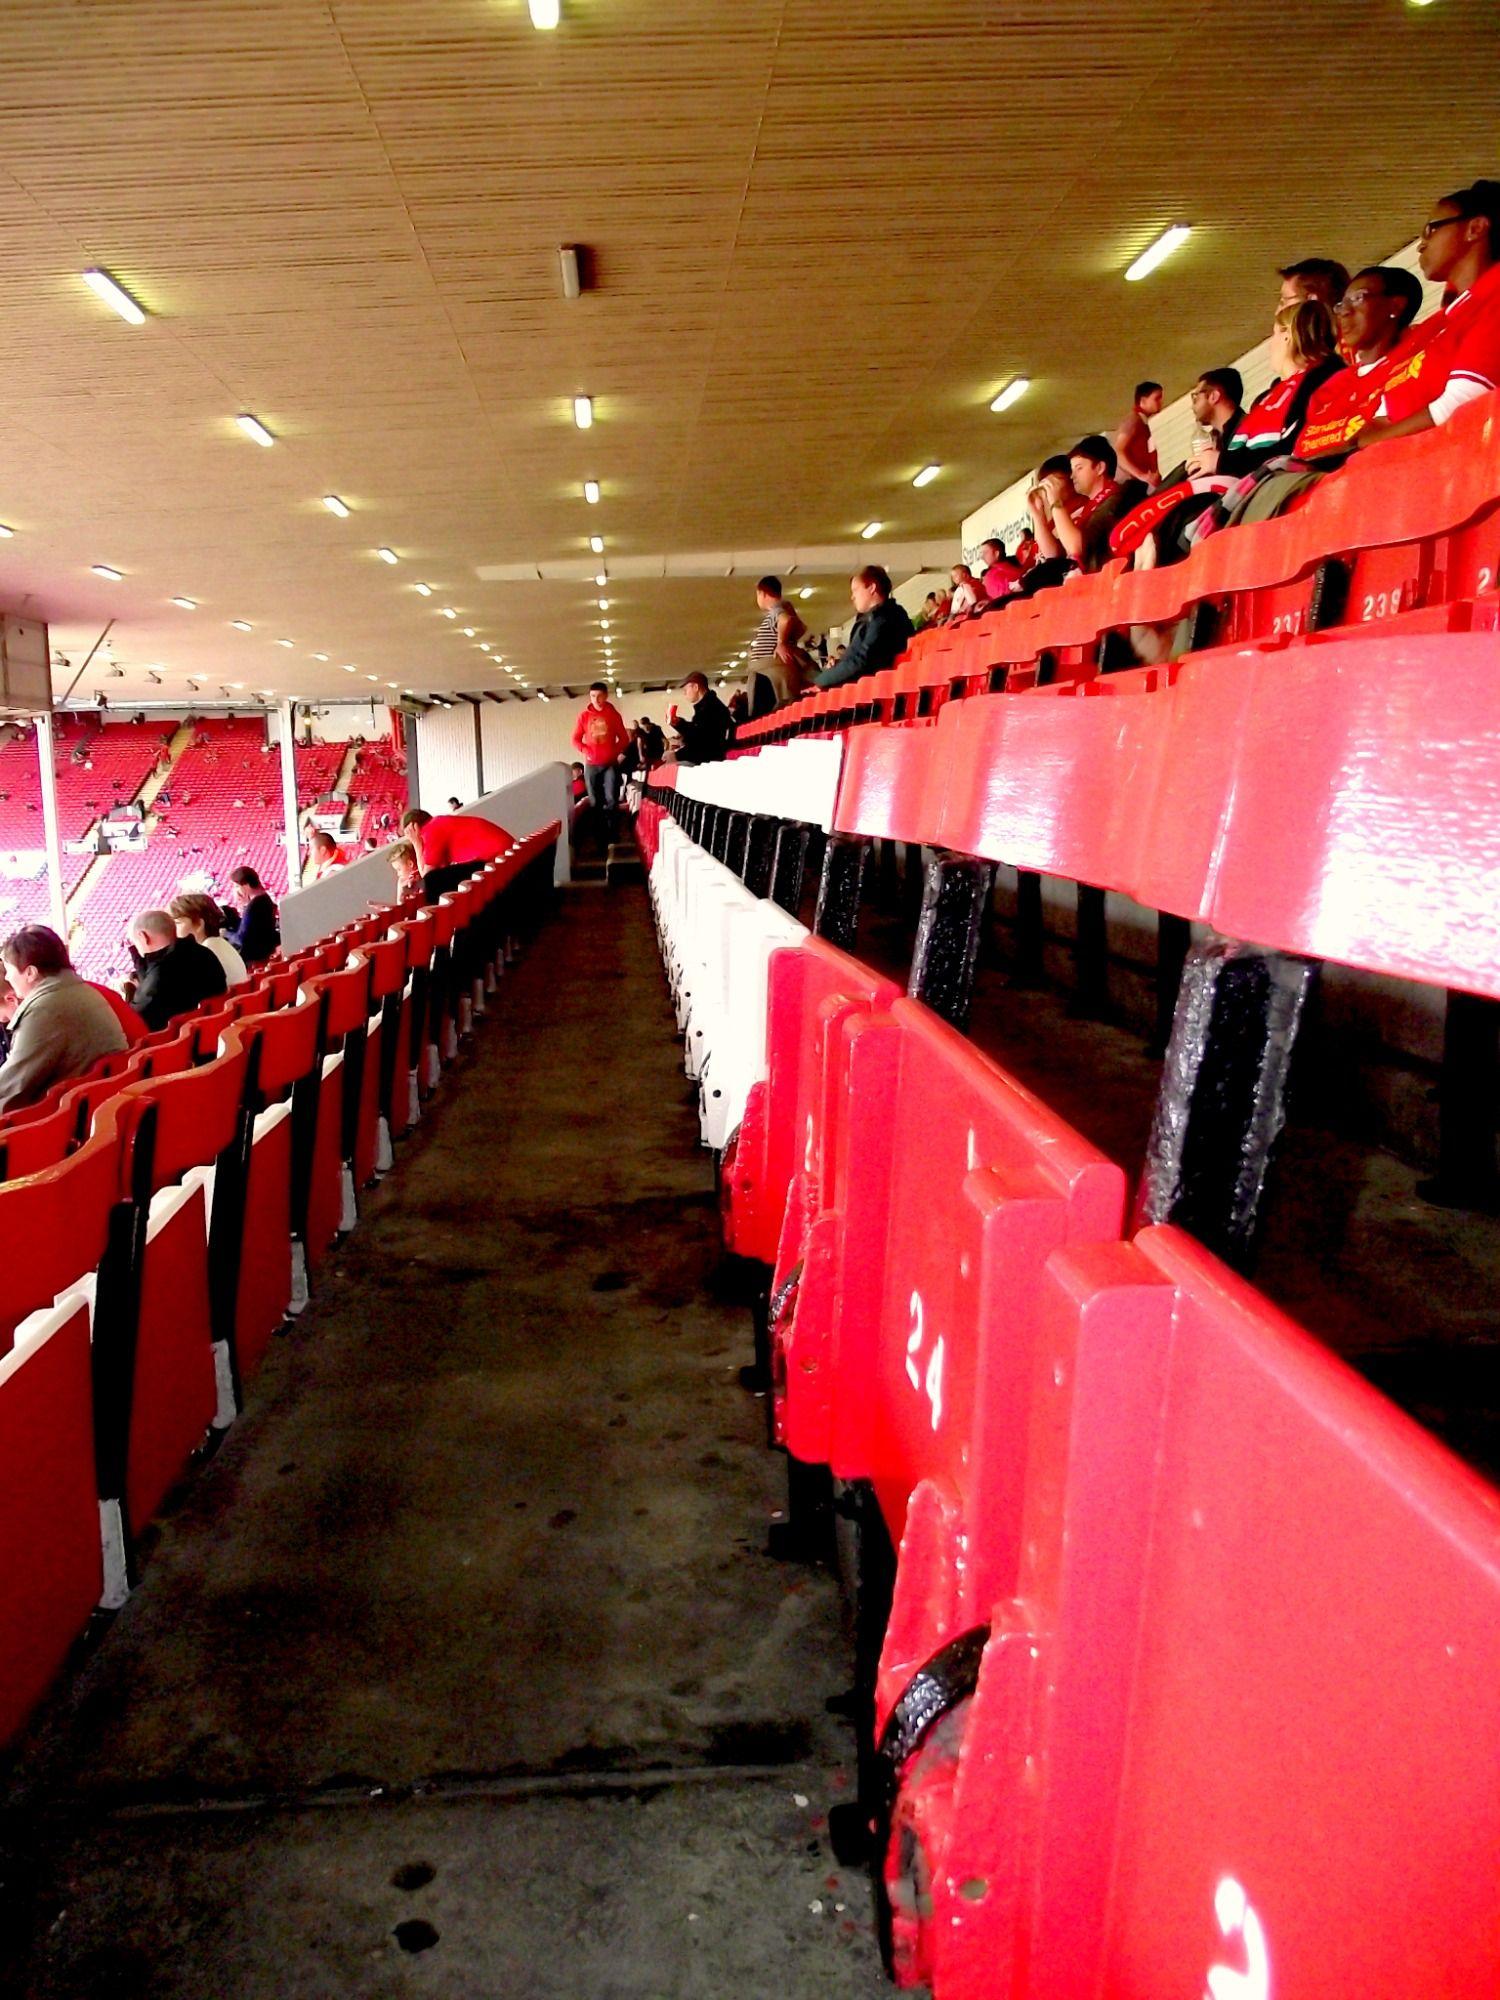 Anfield By Palig Darakjian #TheKop #lfc #Liverpool #reds